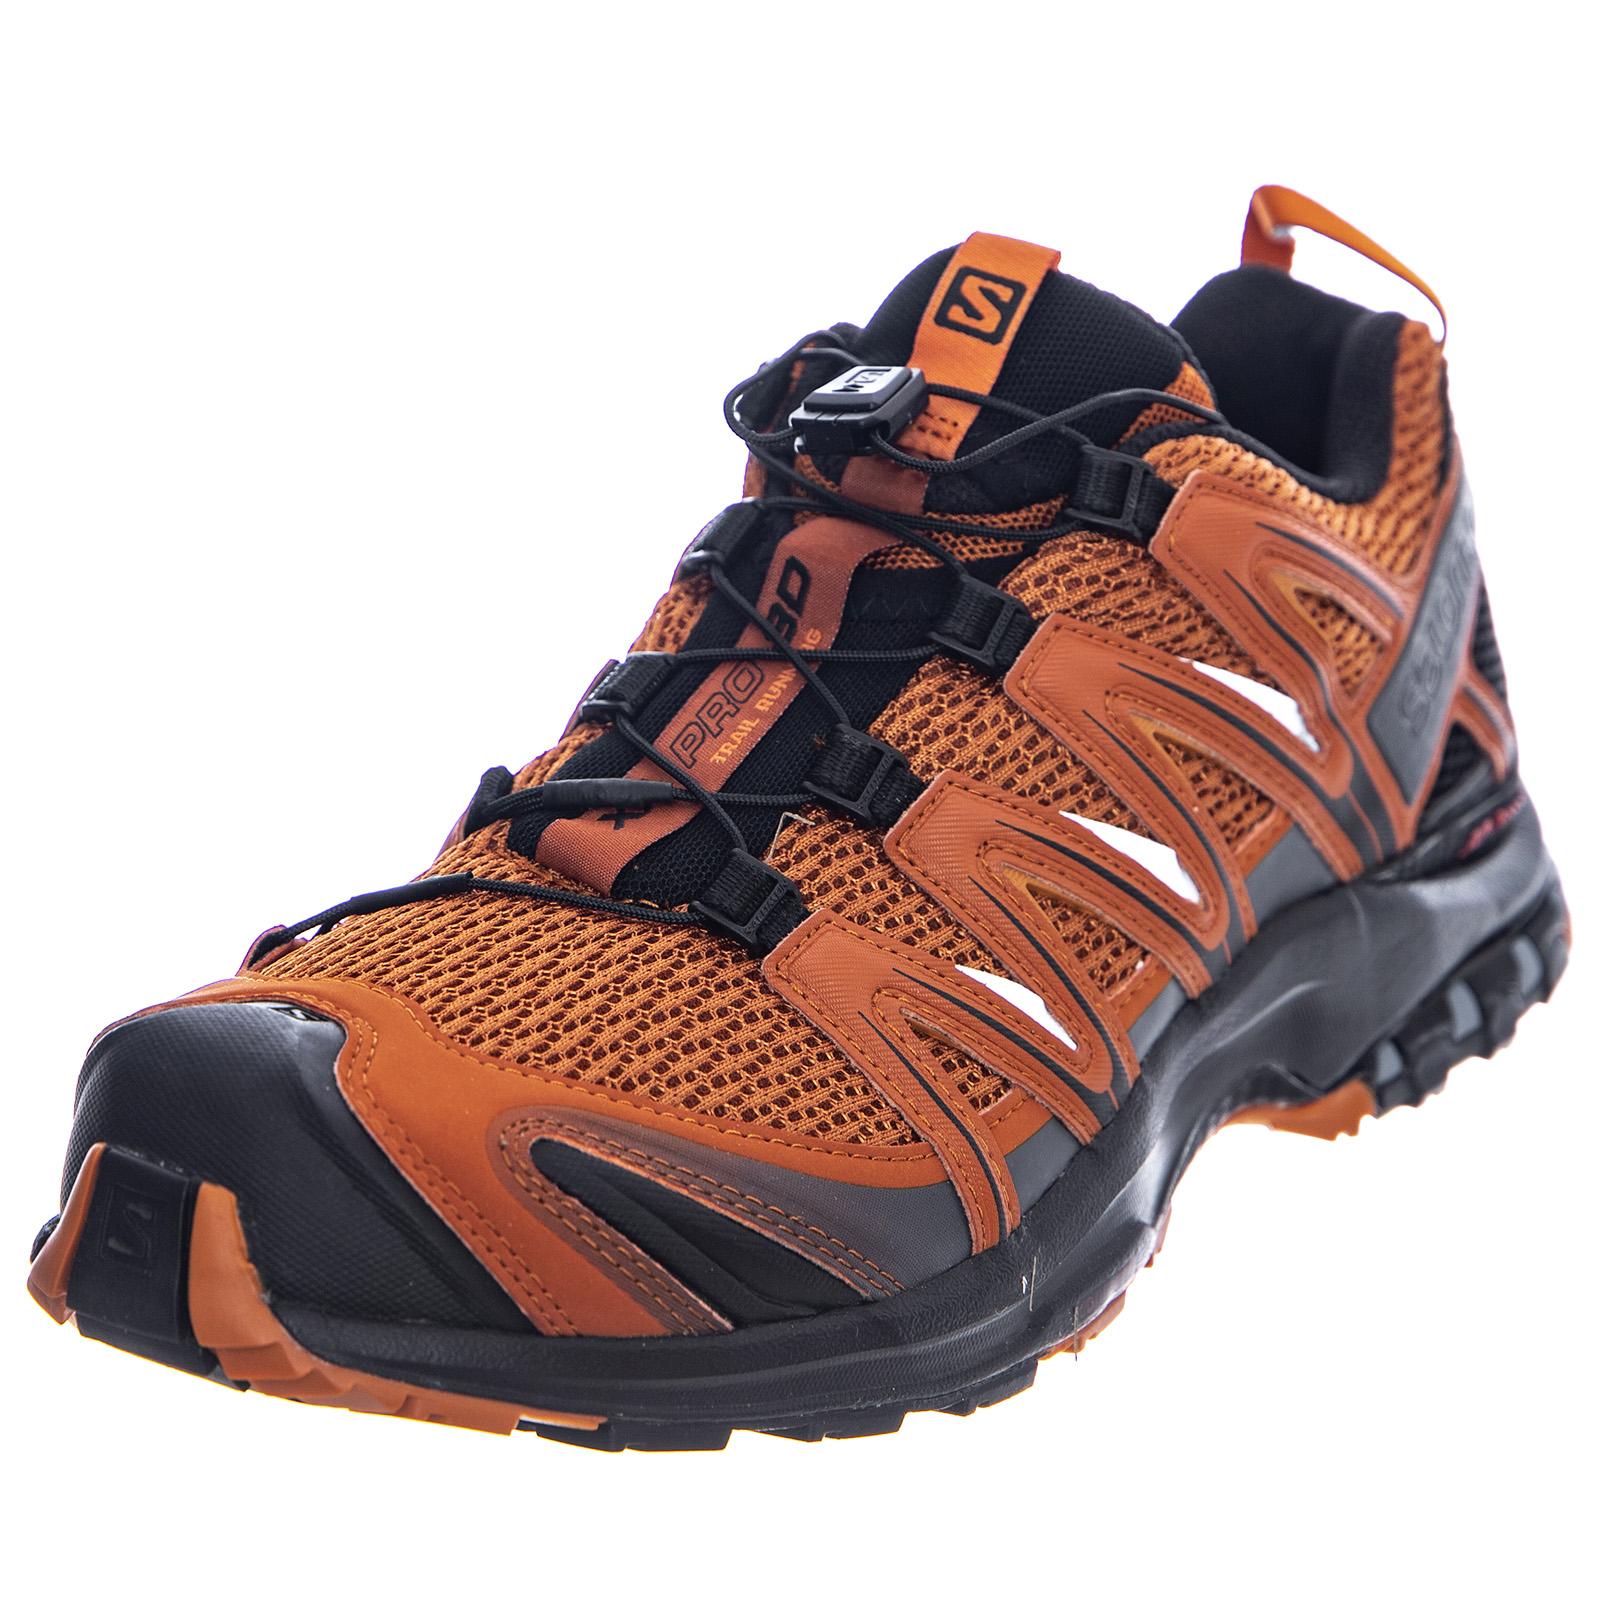 Salomon Men S Xa Pro 3d Gtx Trail Runner Running Shoes Review Cs Waterproof Mens Outdoor Gear Trending Now Expocafeperu Com